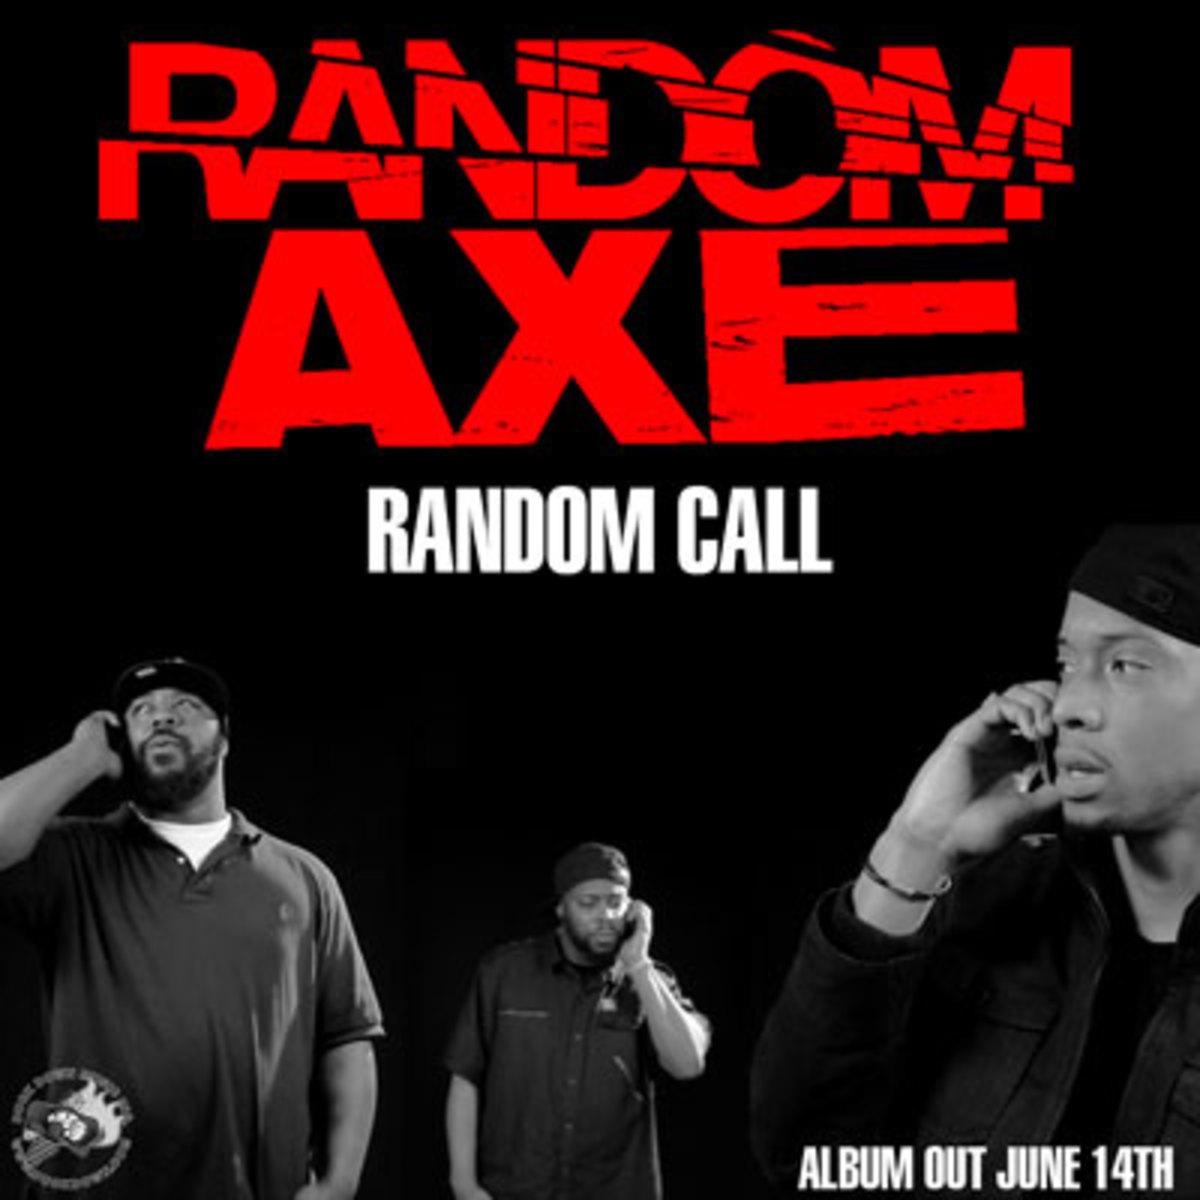 randomaxe-randomcall.jpg